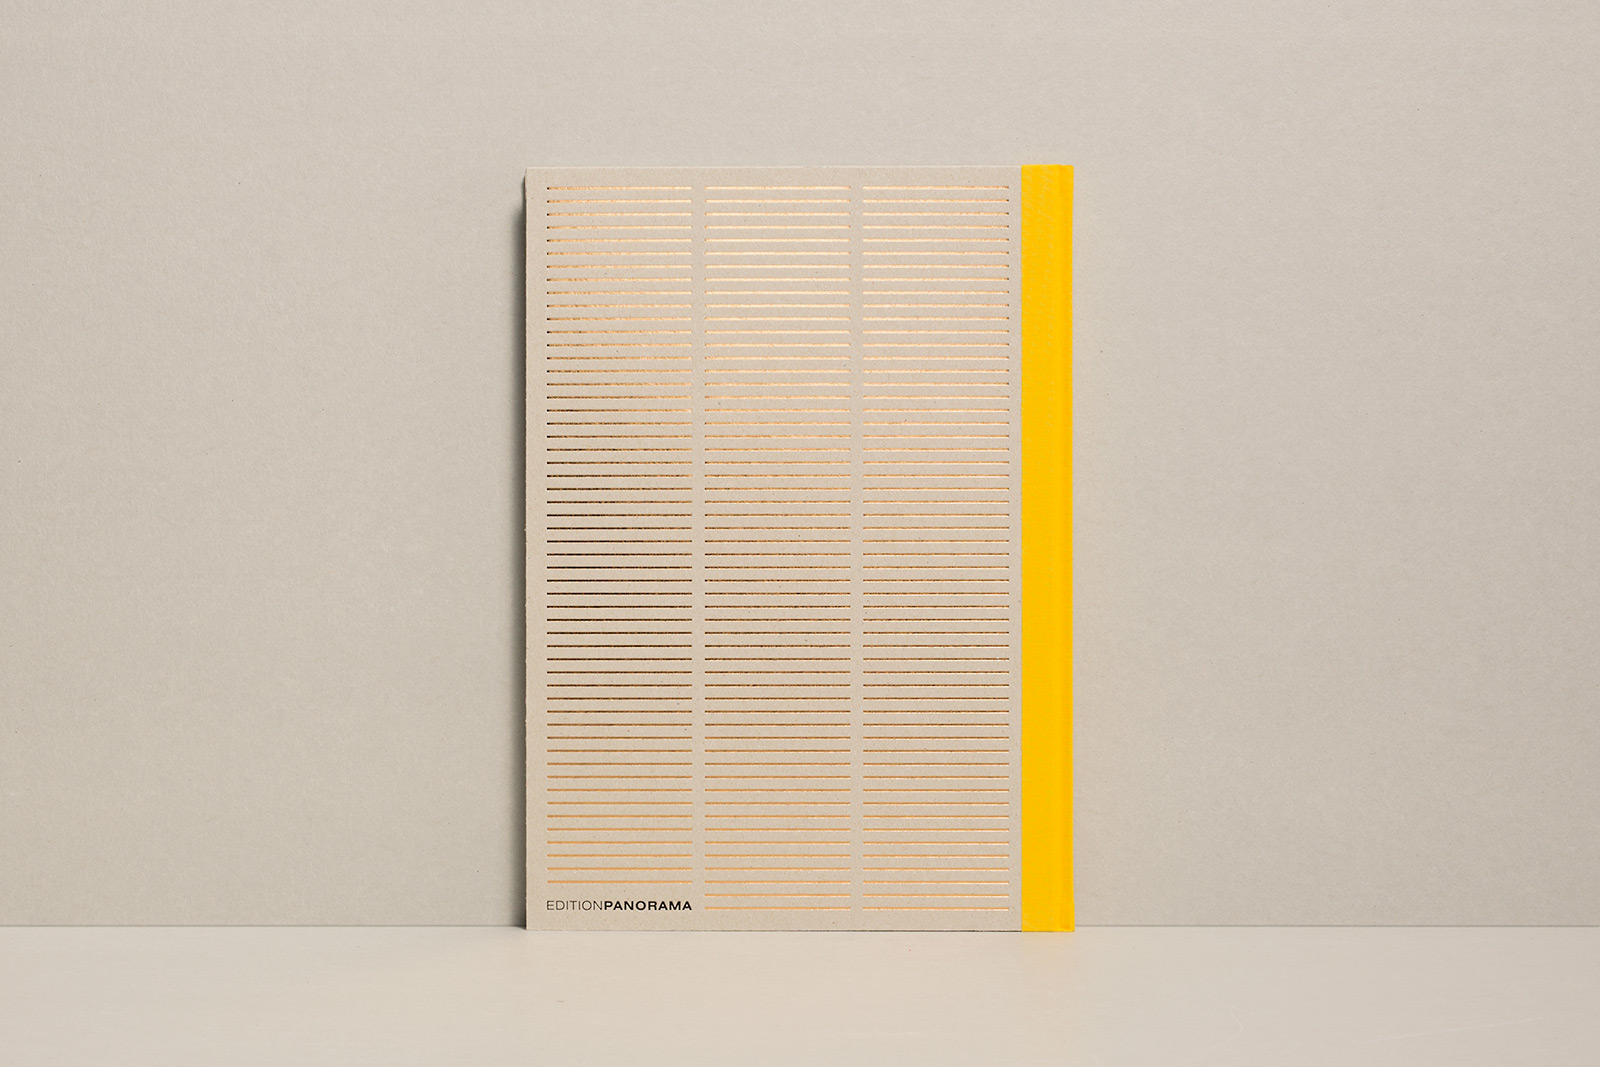 Buch-Repro1108.jpg